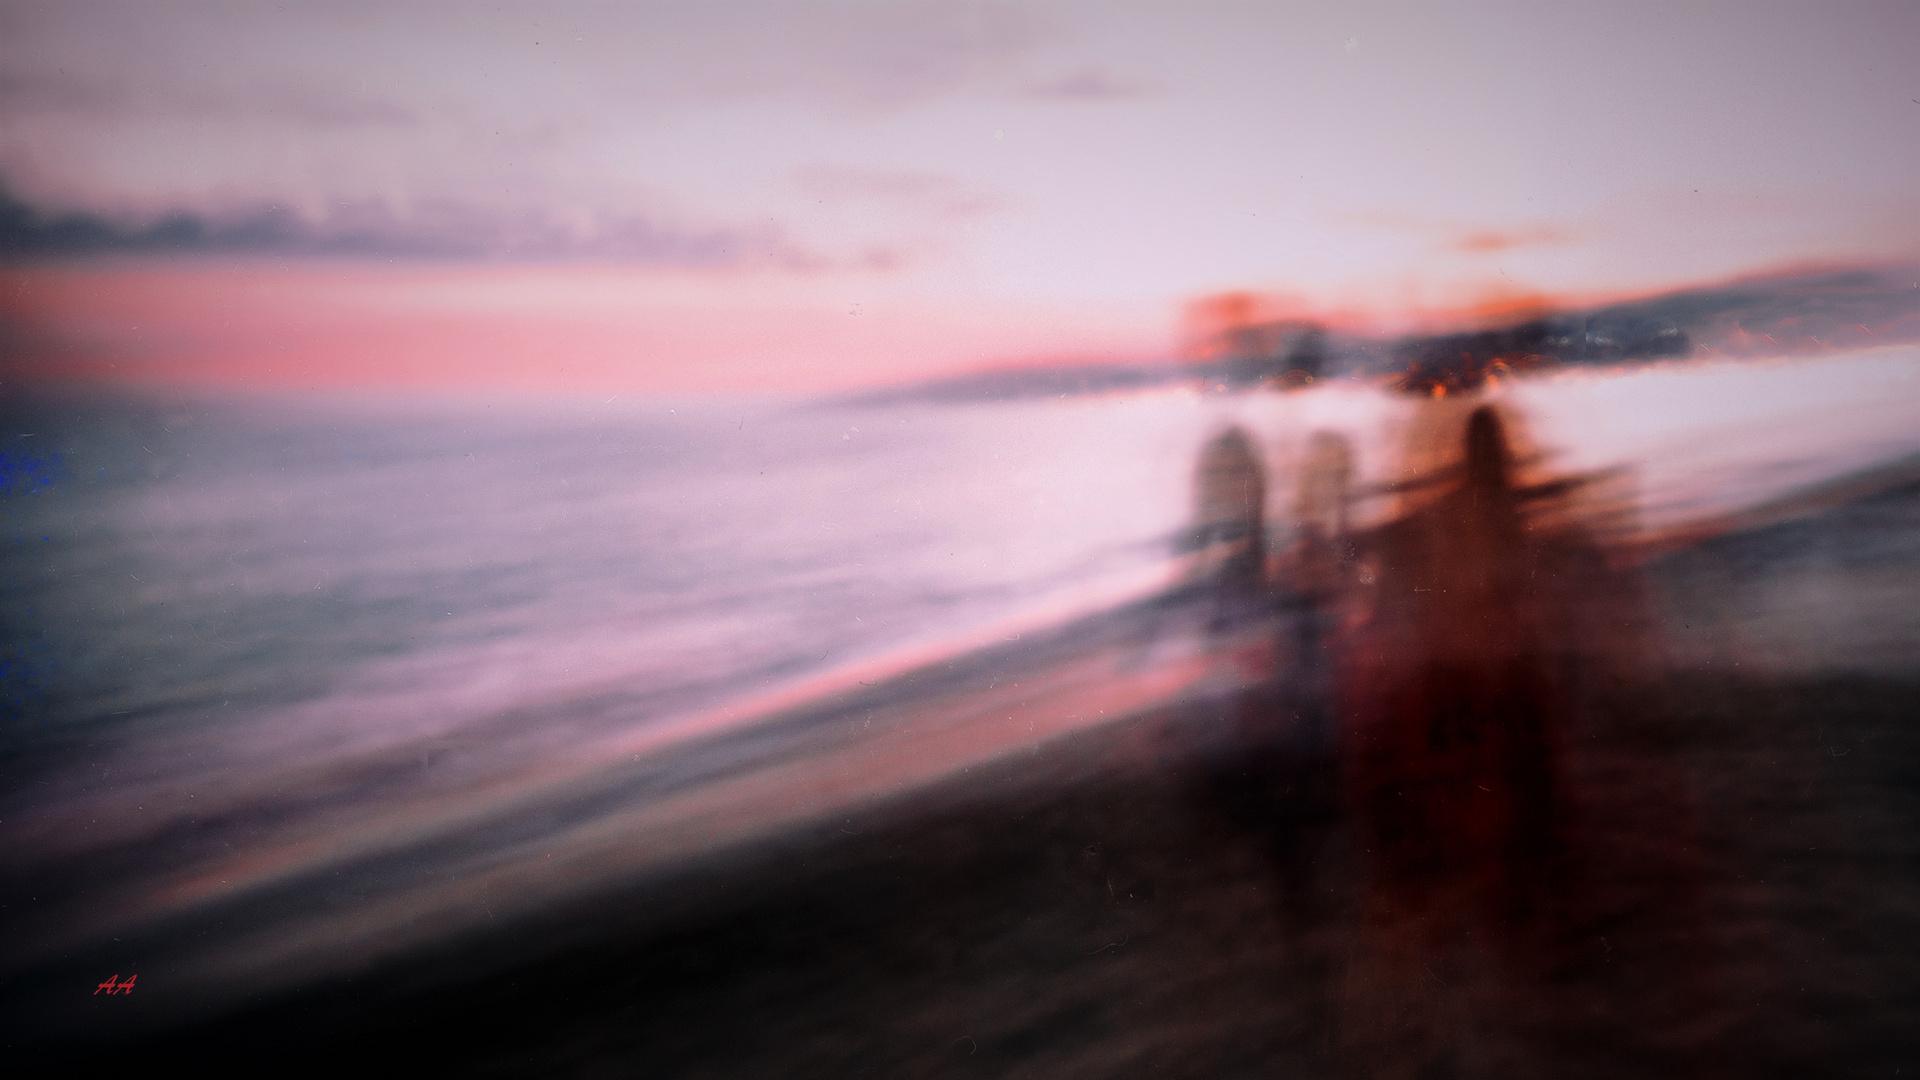 entropic sunset